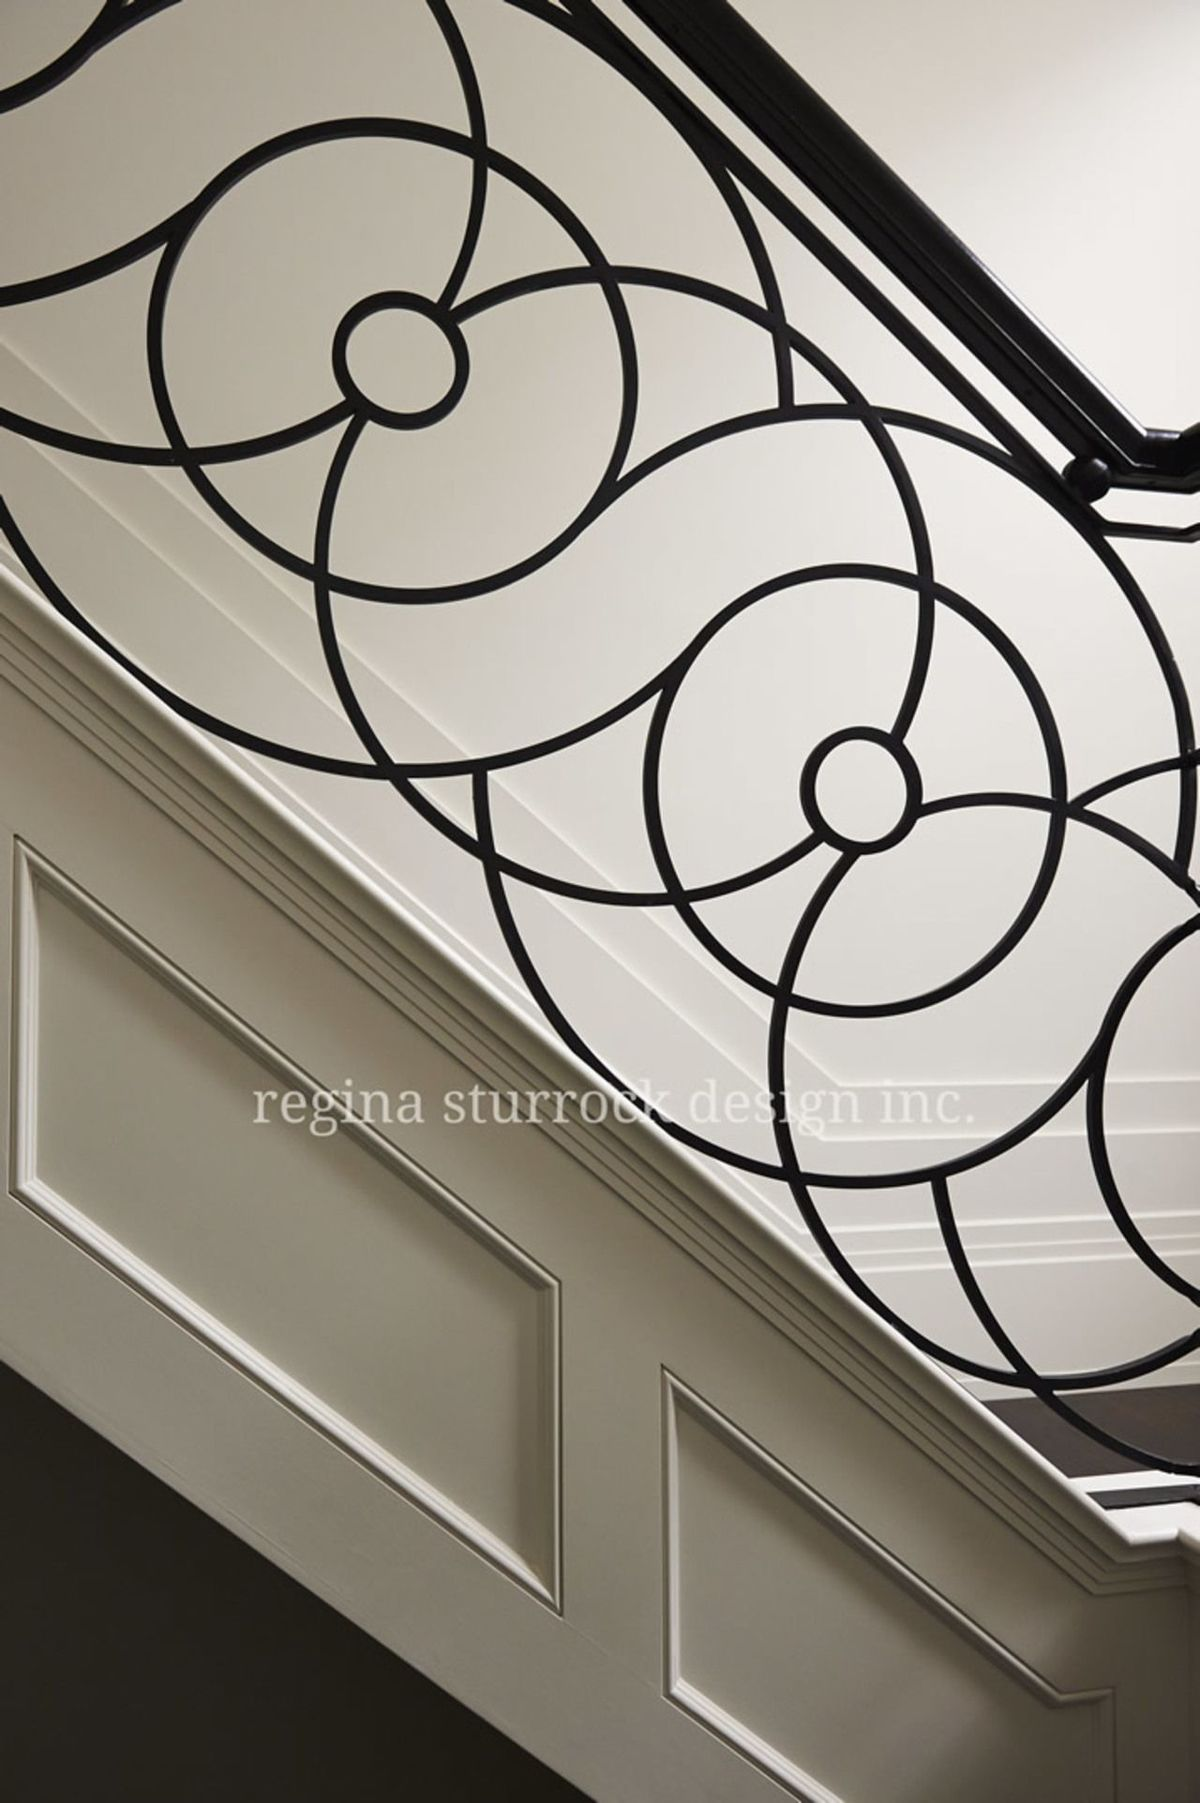 Regina Sturrock Design Inc sbid international design awards 2014 | livegreenblog